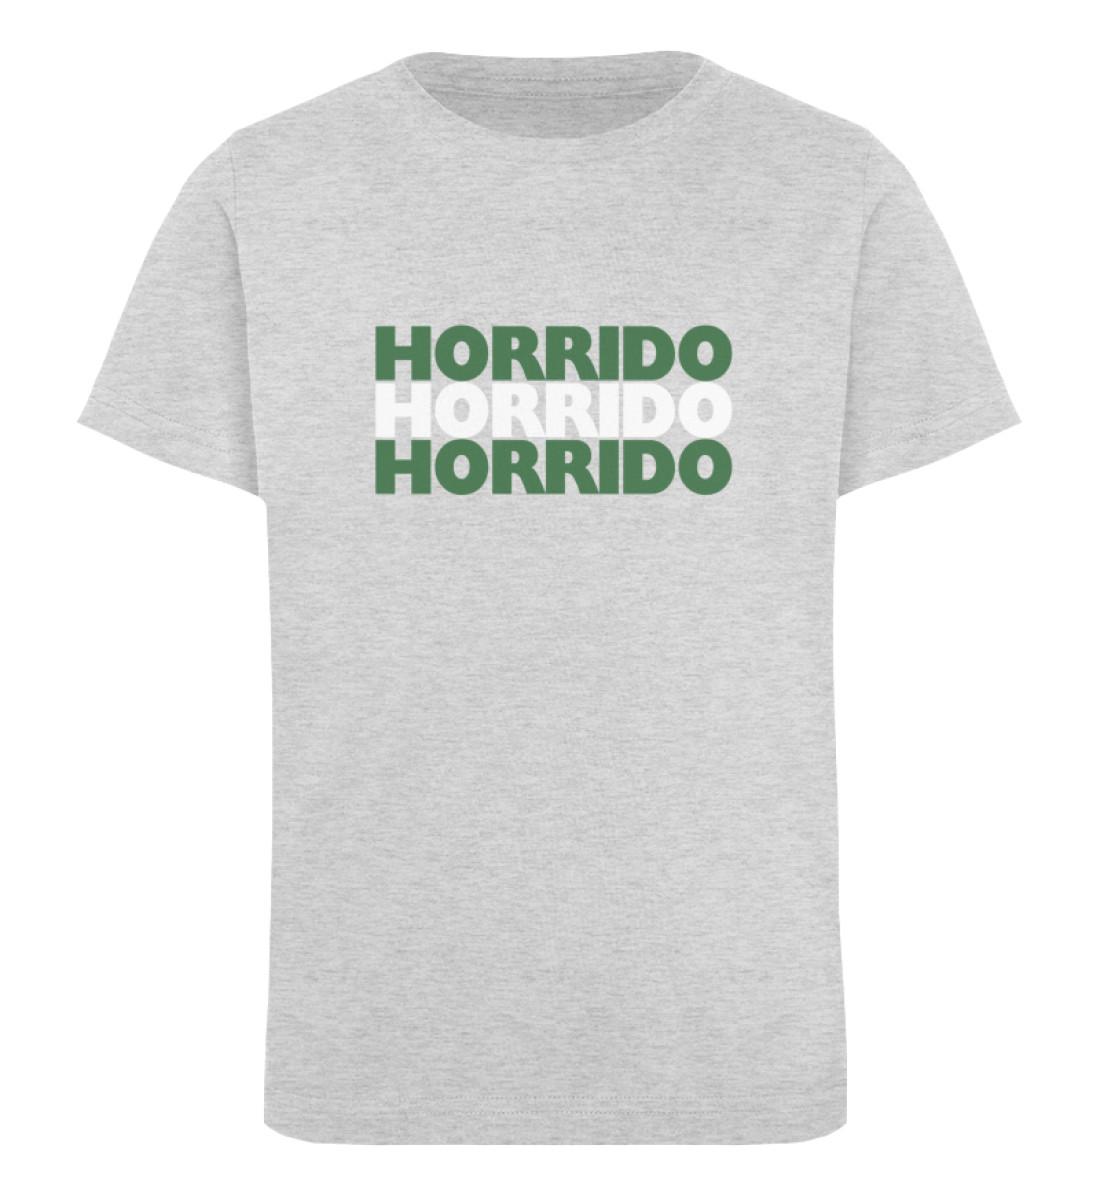 Horrido - Kinder Organic T-Shirt-6892